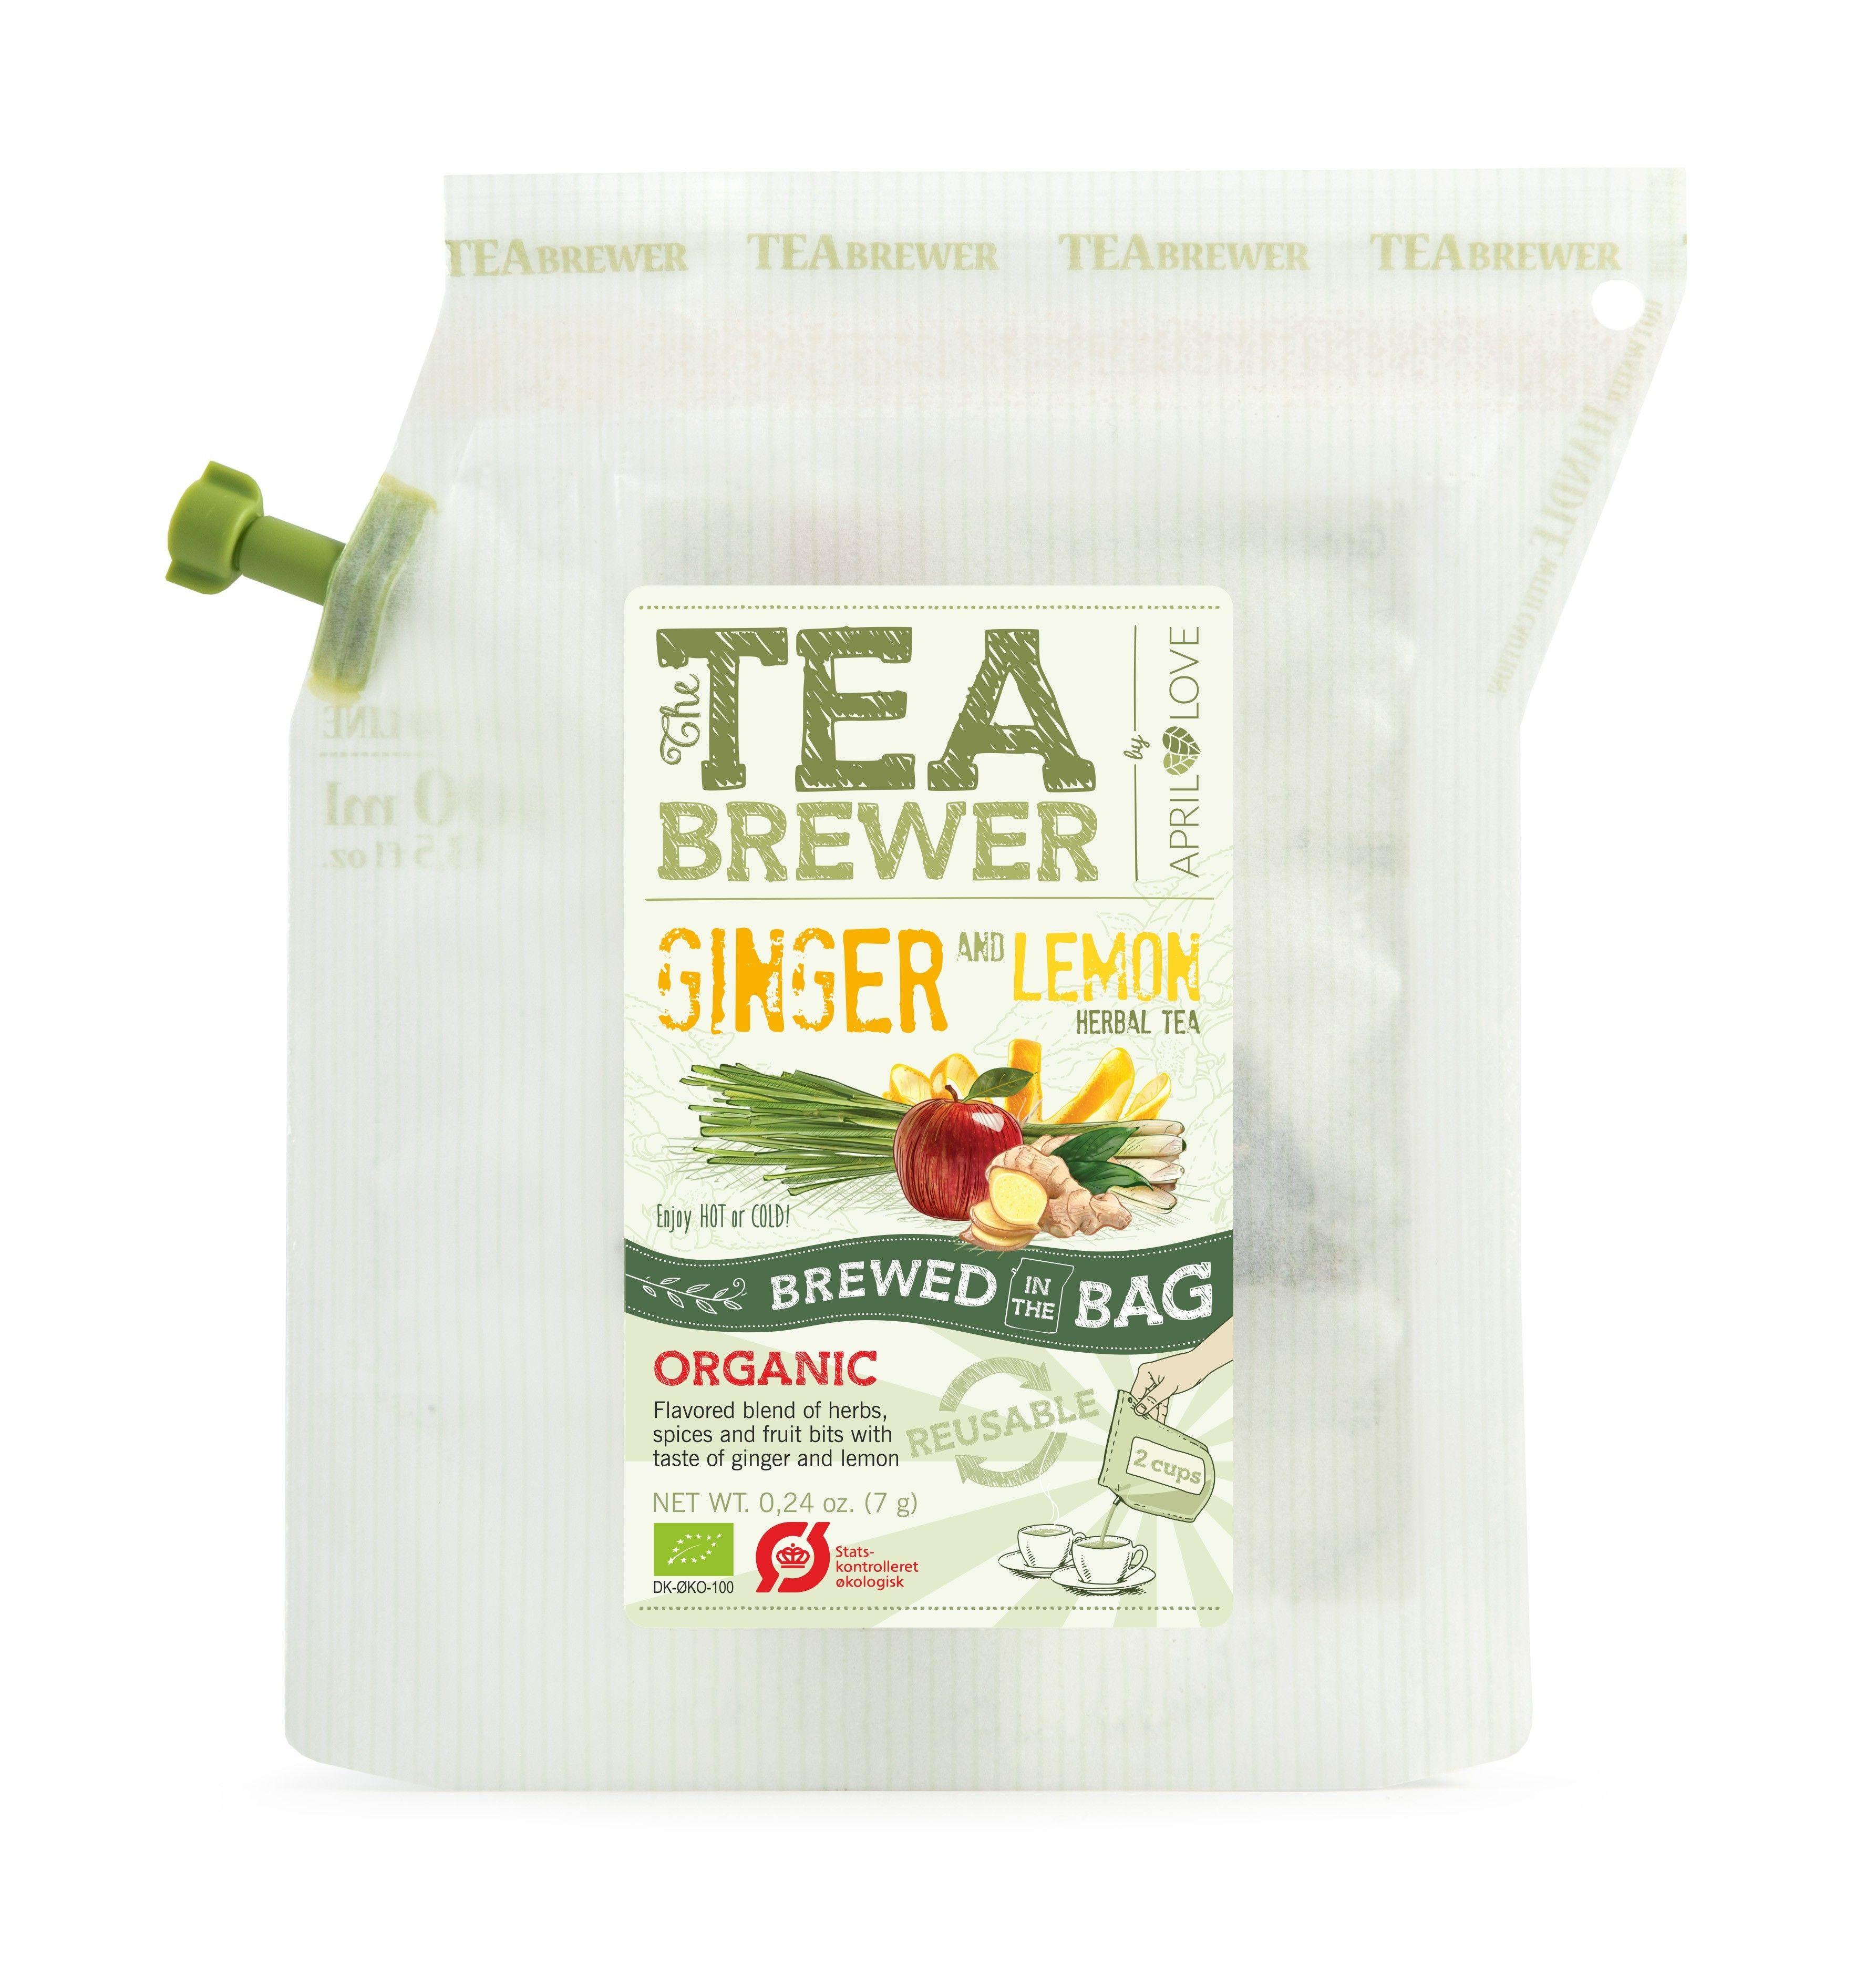 TEA BREWER   【Ginger and Lemon Herbal Tea】